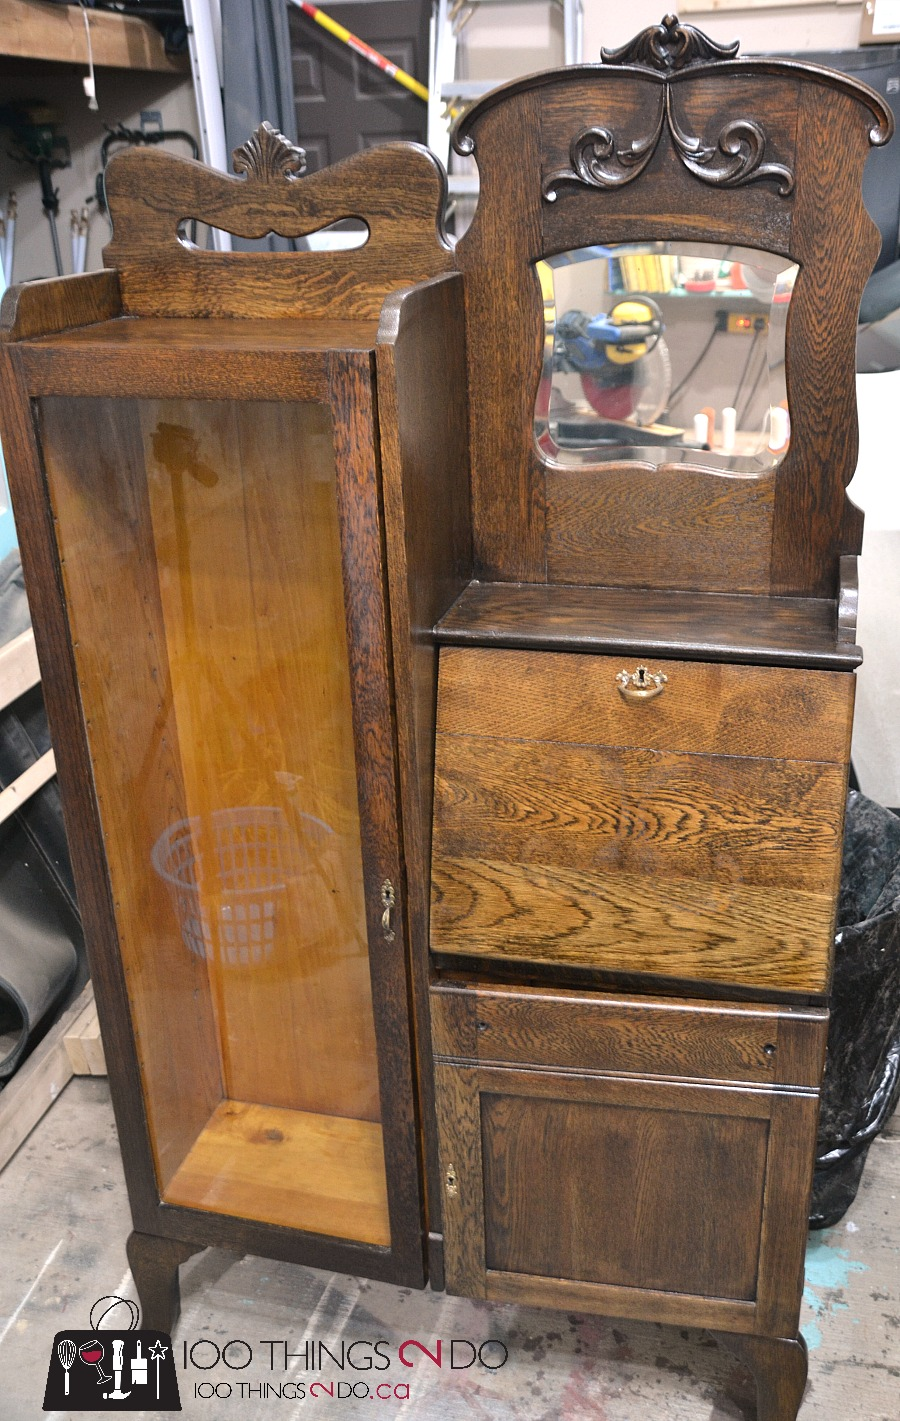 Antique secretary desk, refinished secretary, refinishing antiques, before & after secretary